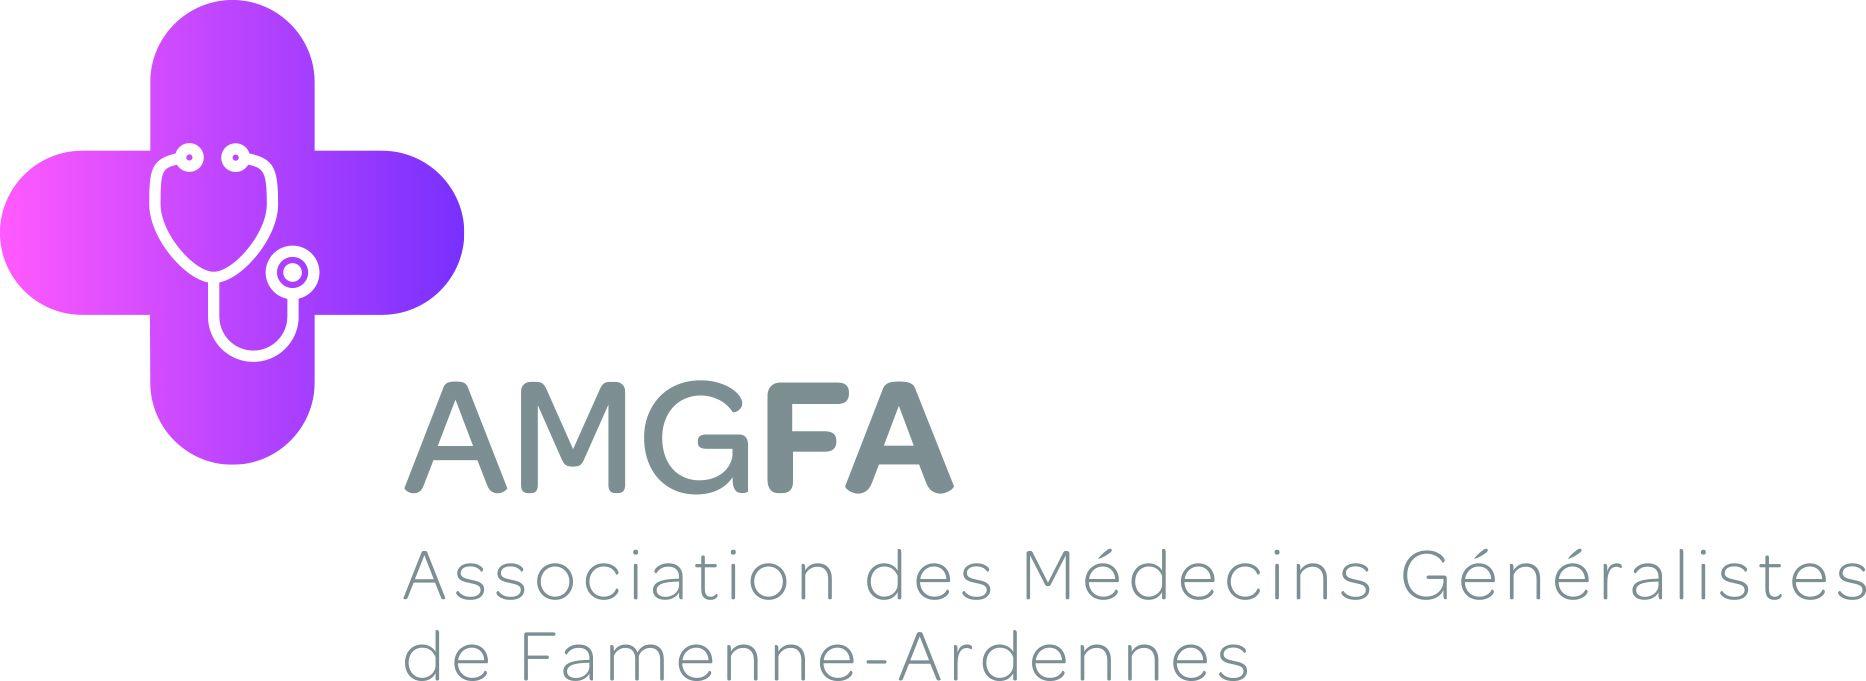 association-des-medecins-generalistes-de-la-region-famenne-ardenne